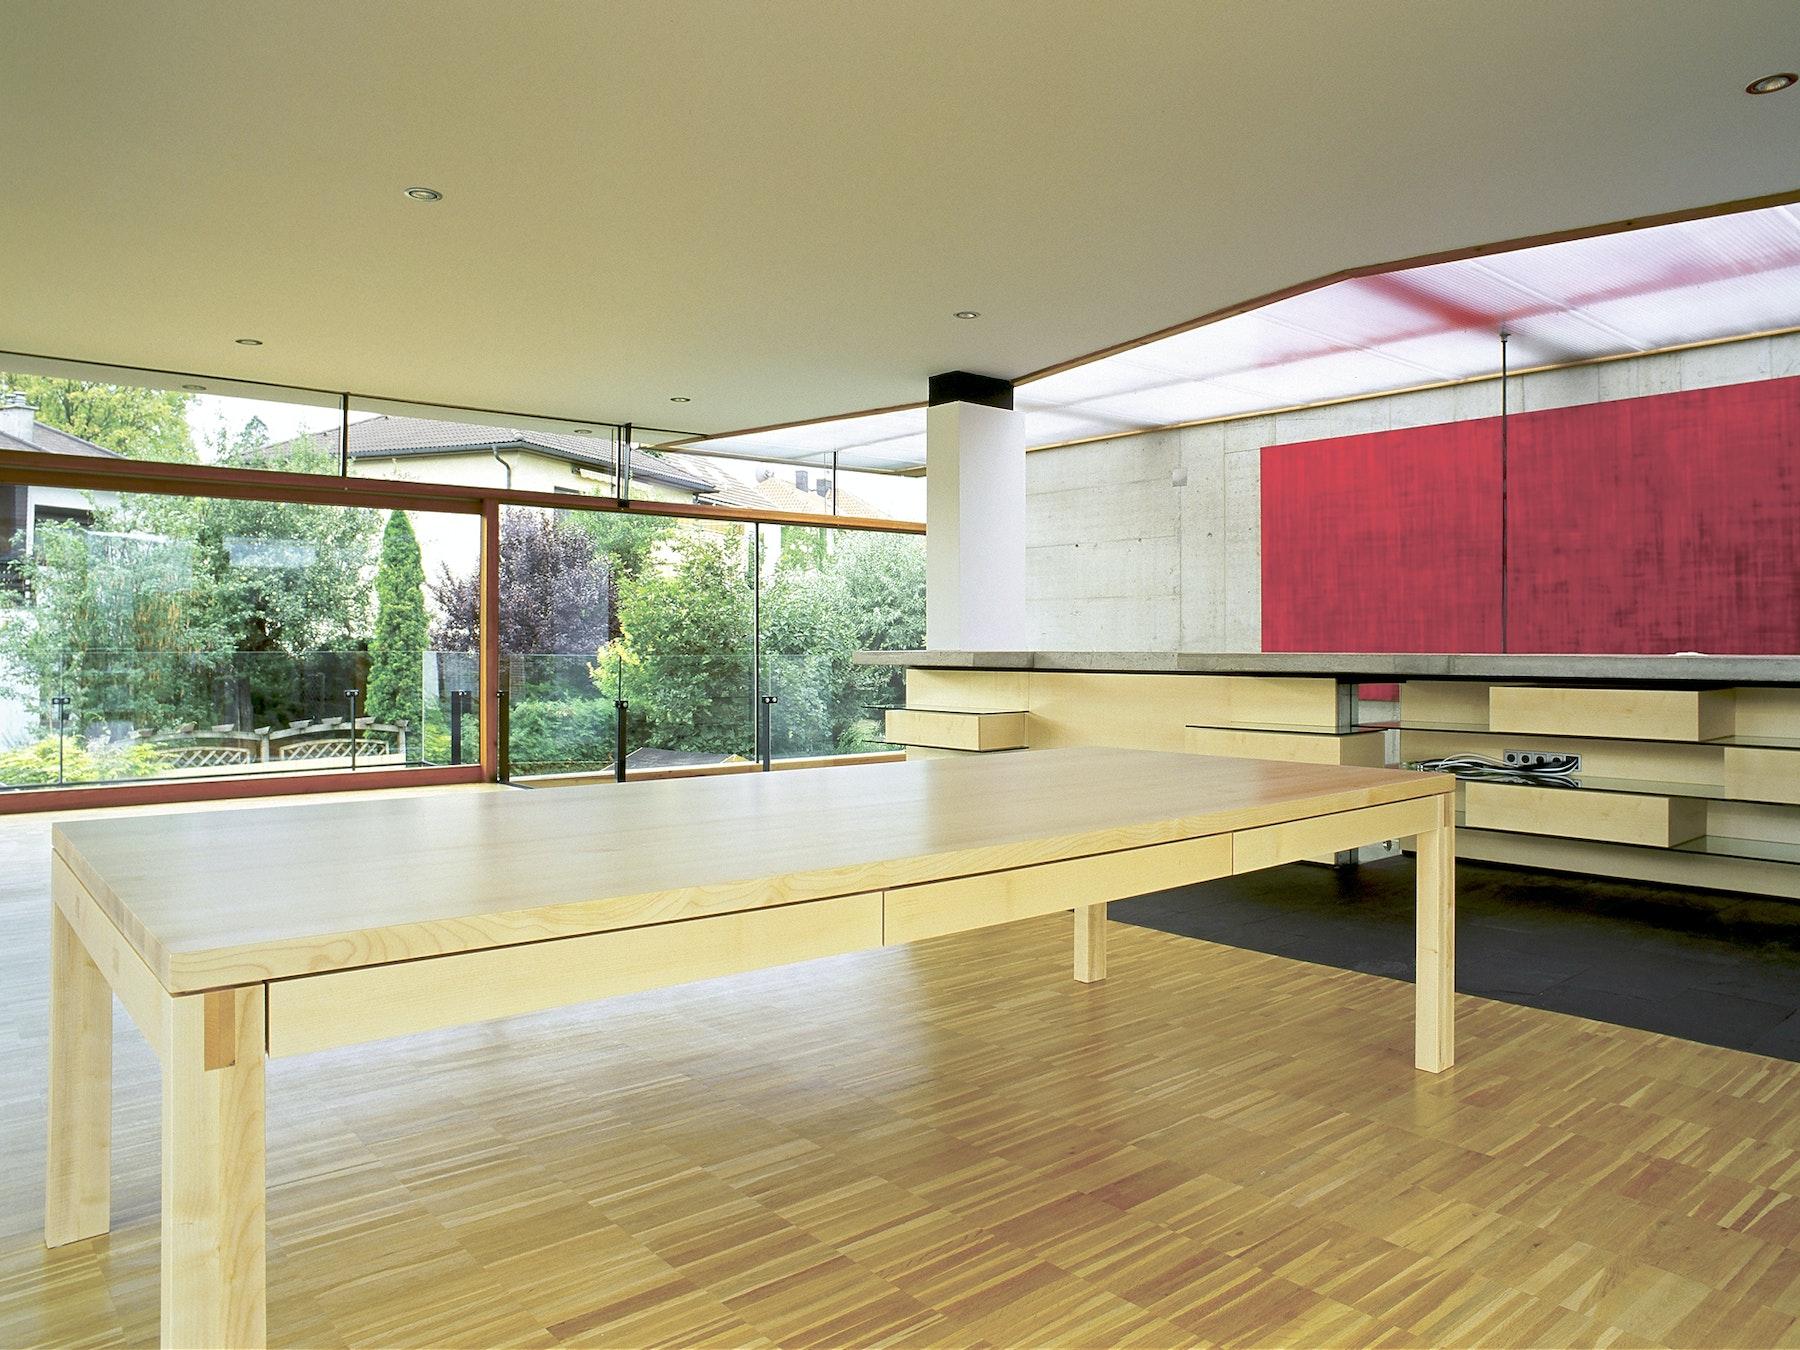 Solar Deck Lew Rodin 79020032